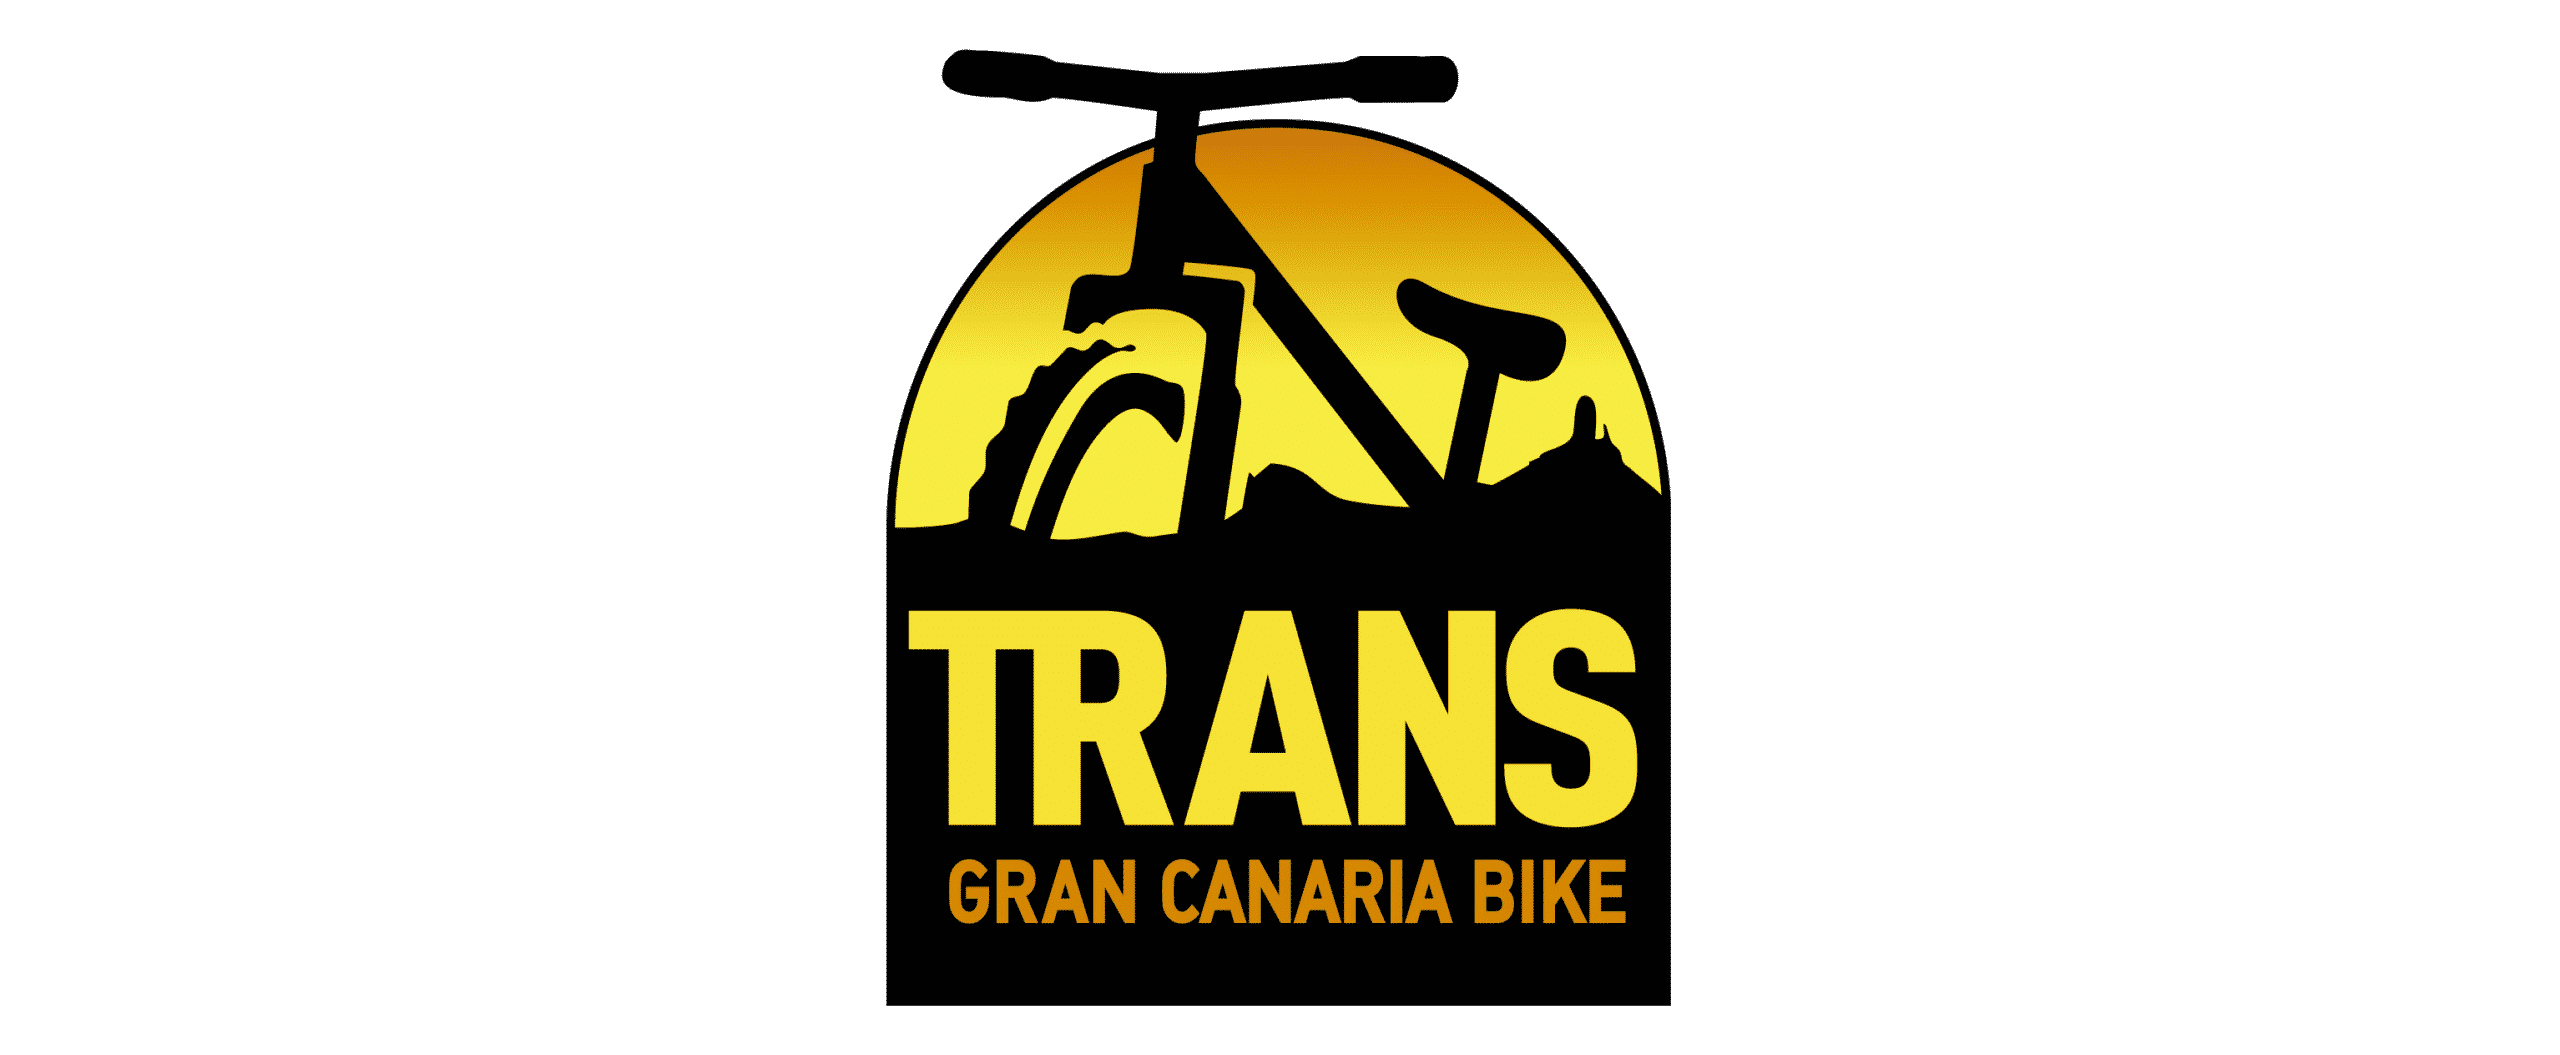 logo transgrancanaria